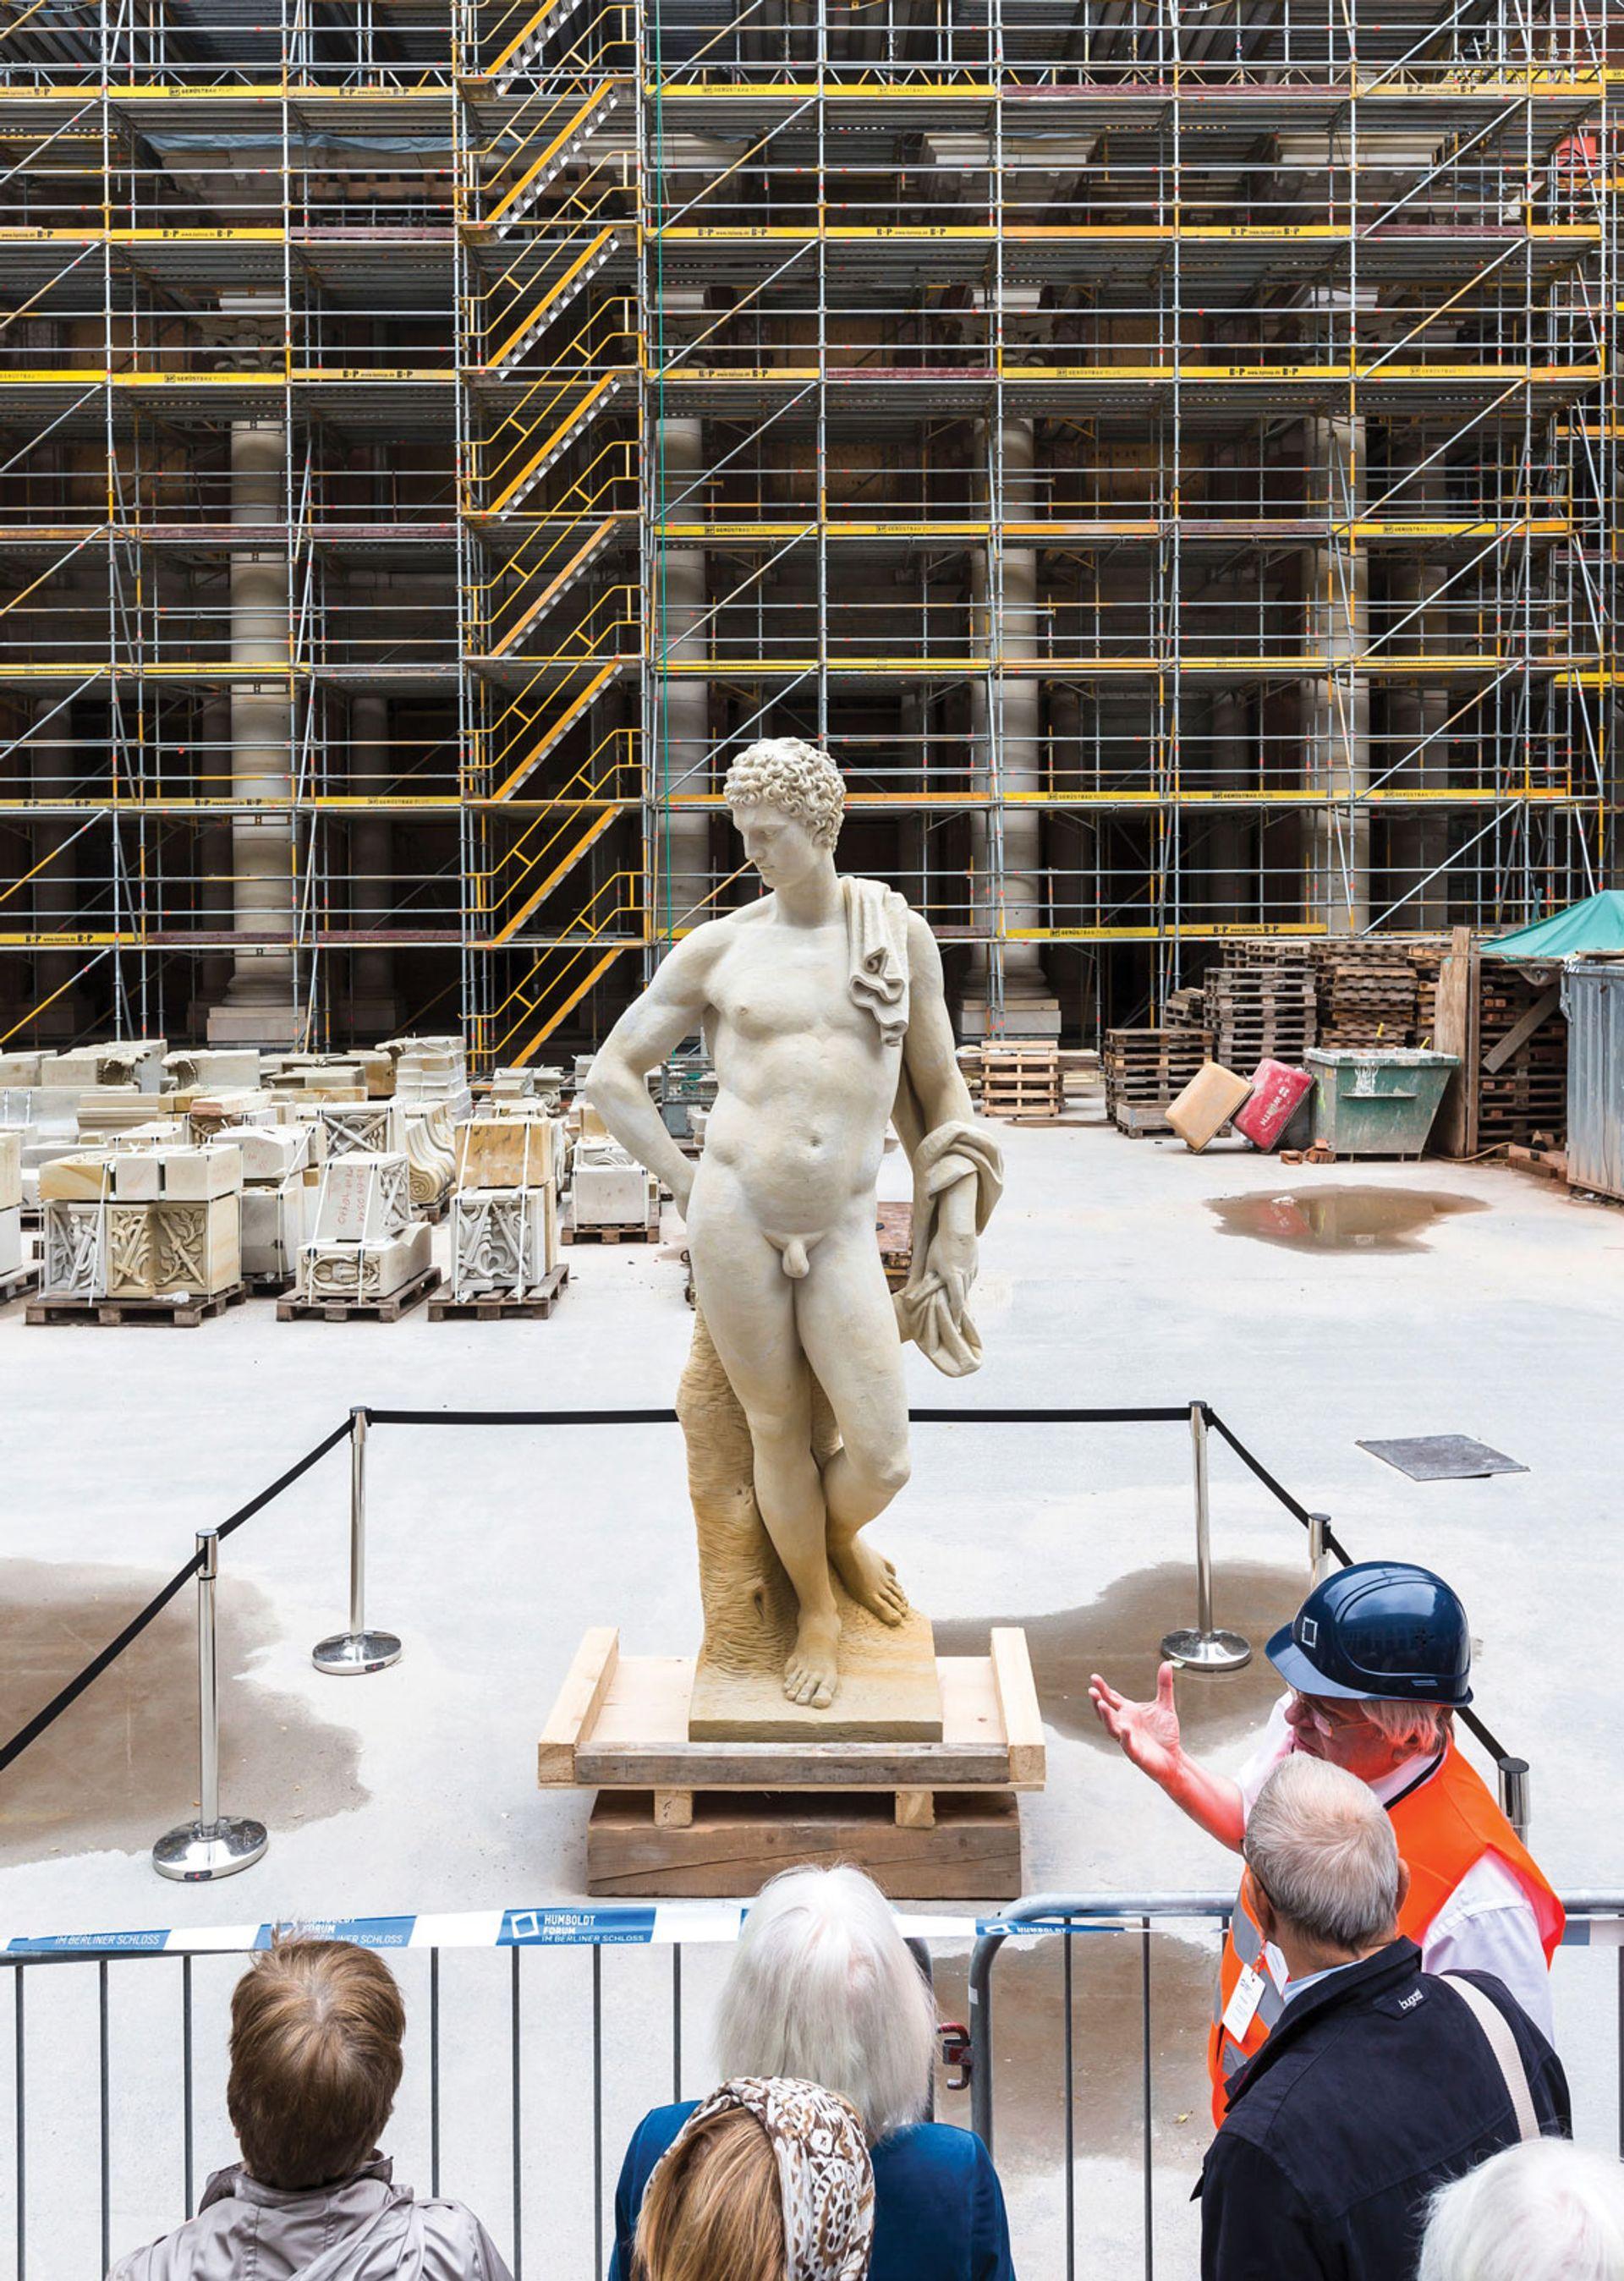 Open days at the Humboldt construction site last June attracted 40,000visitors Stiftung Humboldt Forum im Berliner Schloss/David von Becker